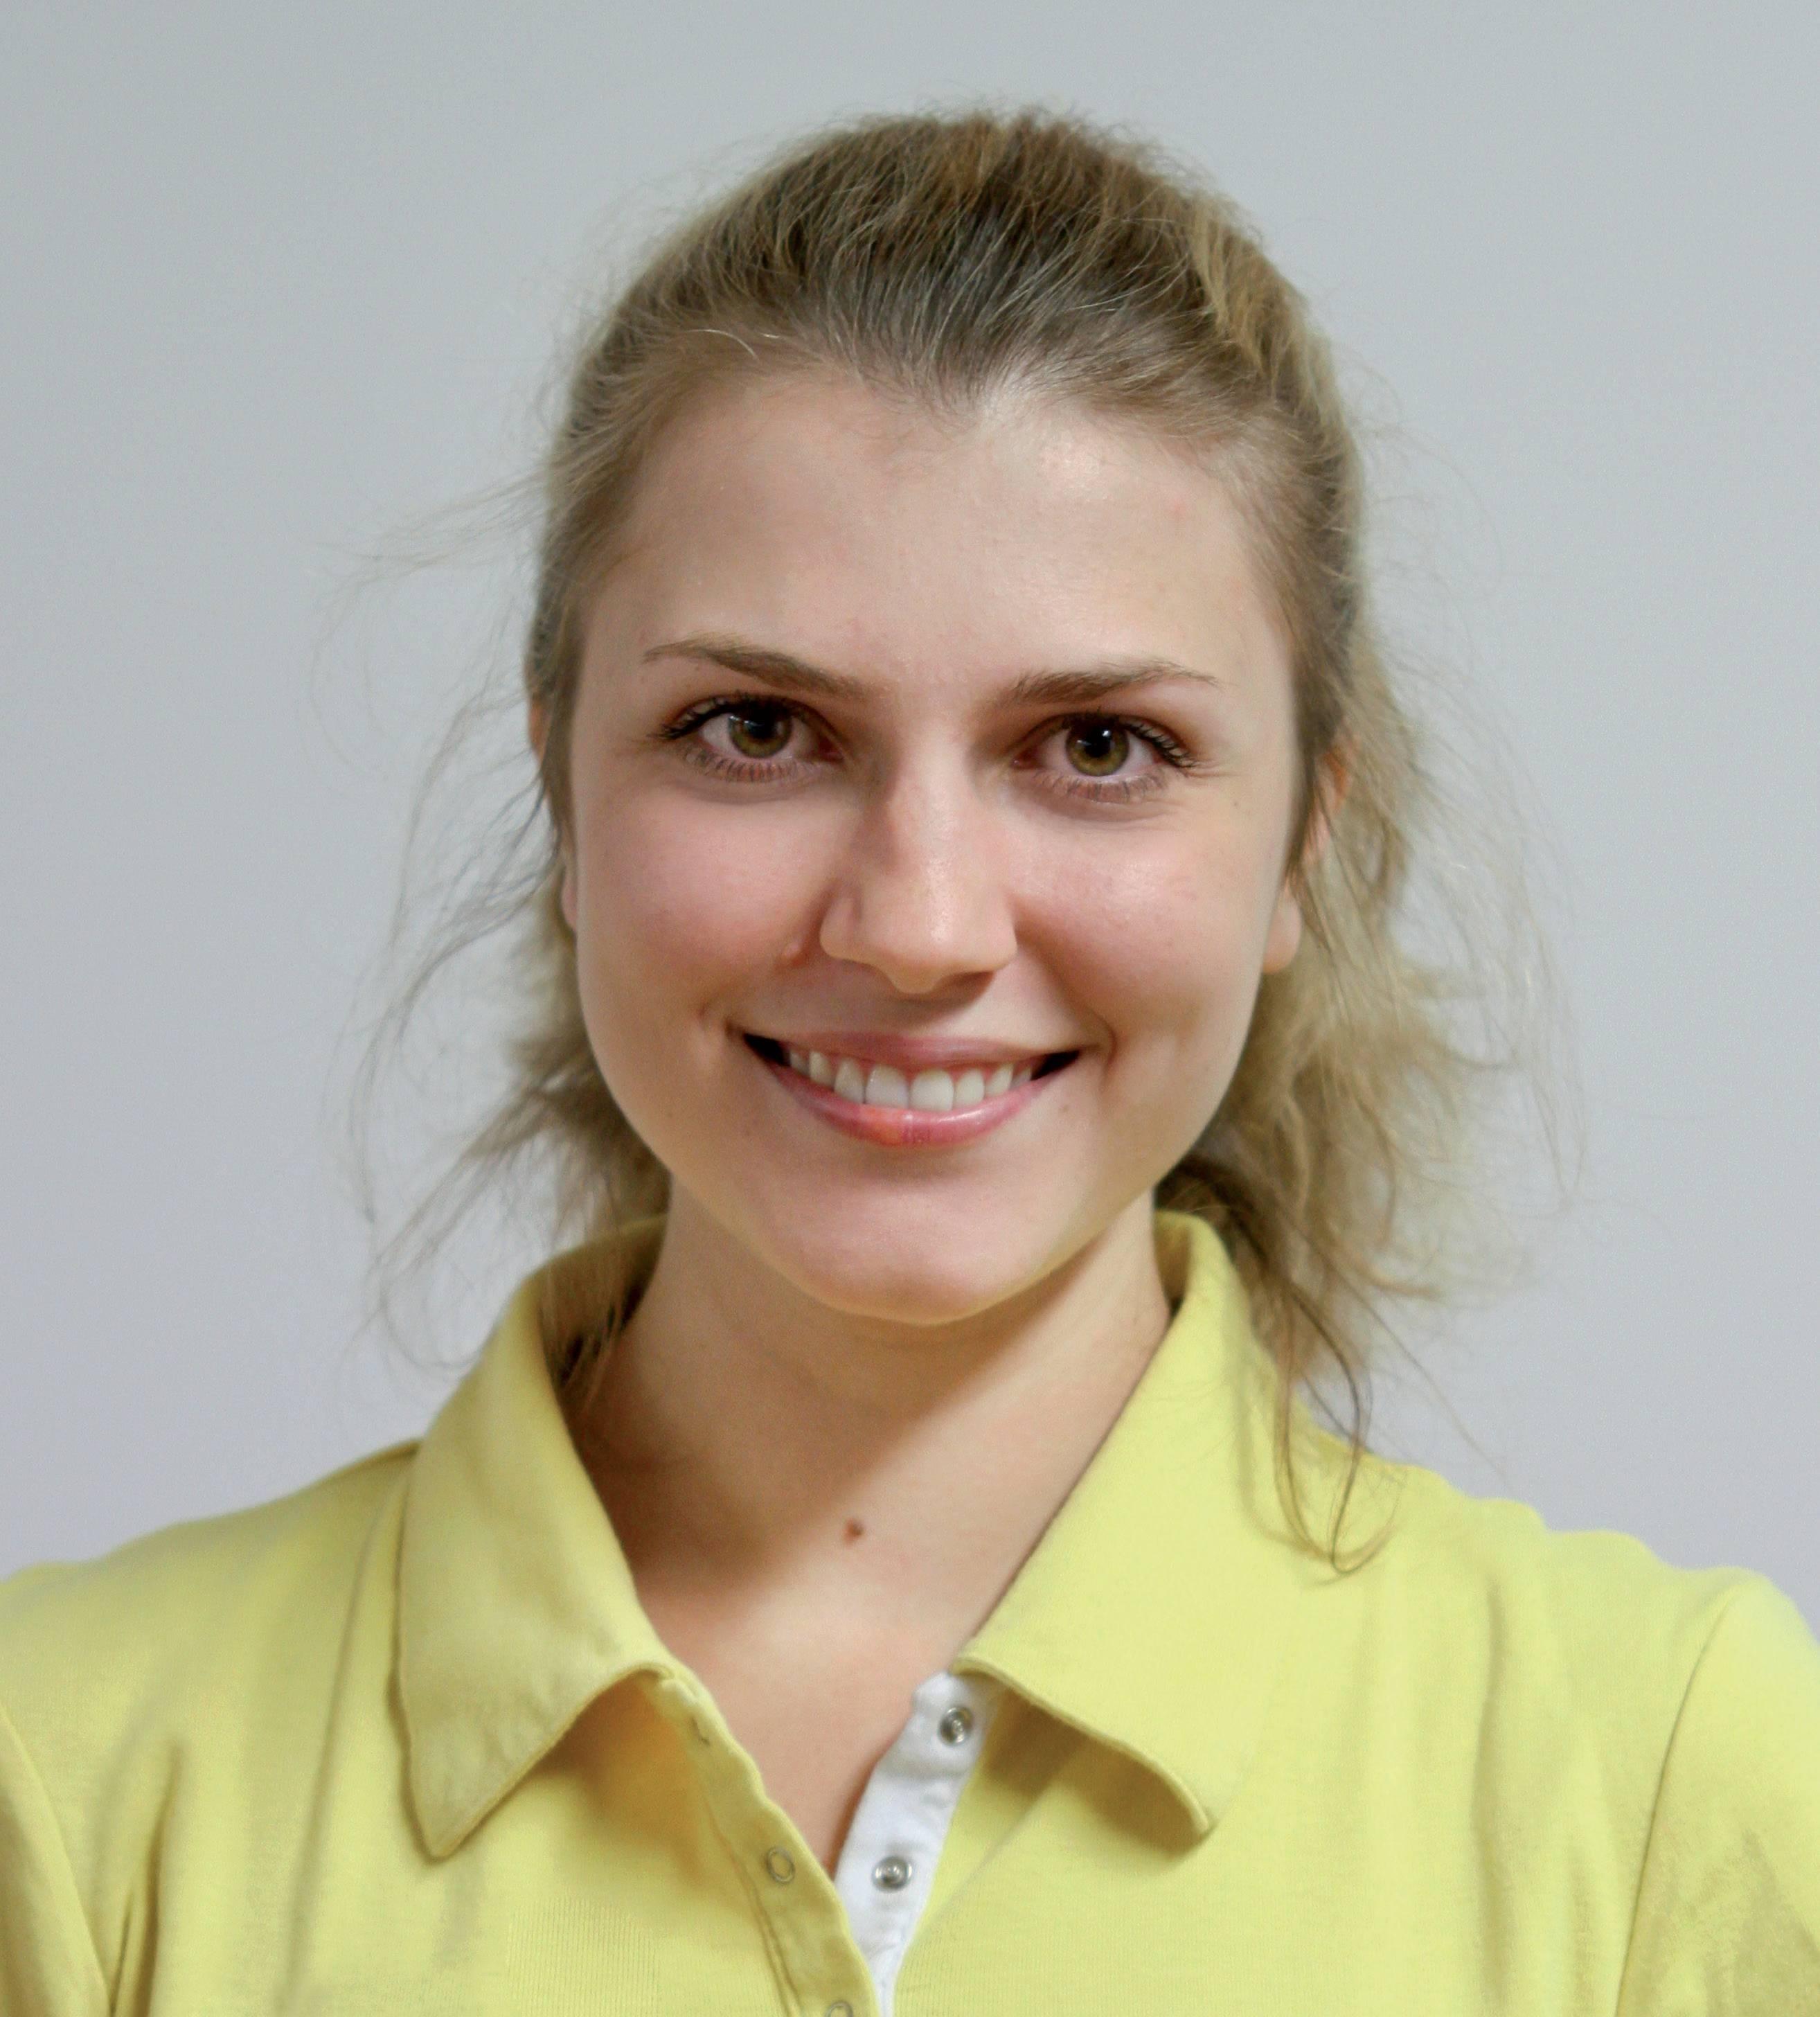 Anastasiya Routchkan